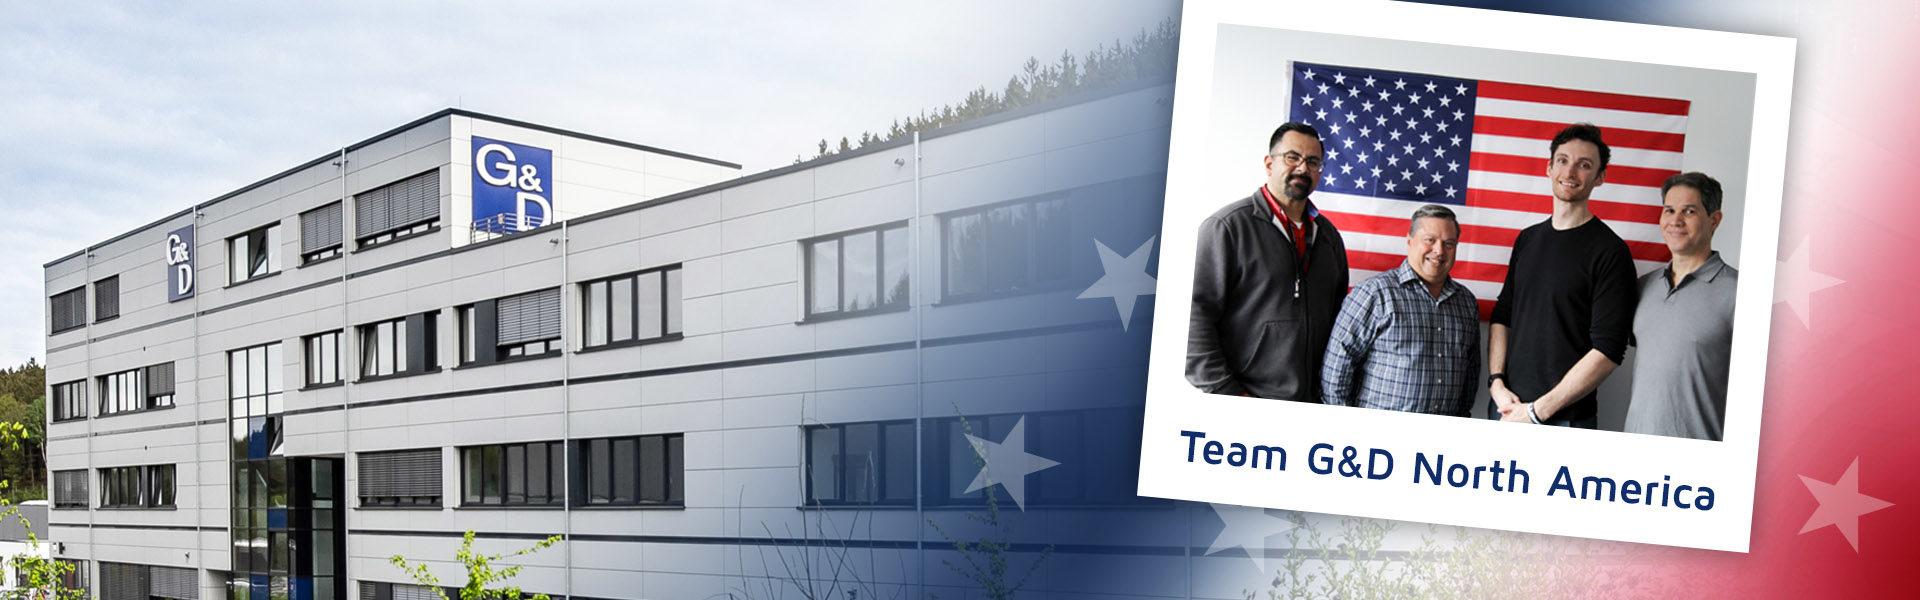 US KVM experts visit German headquarter in Siegen